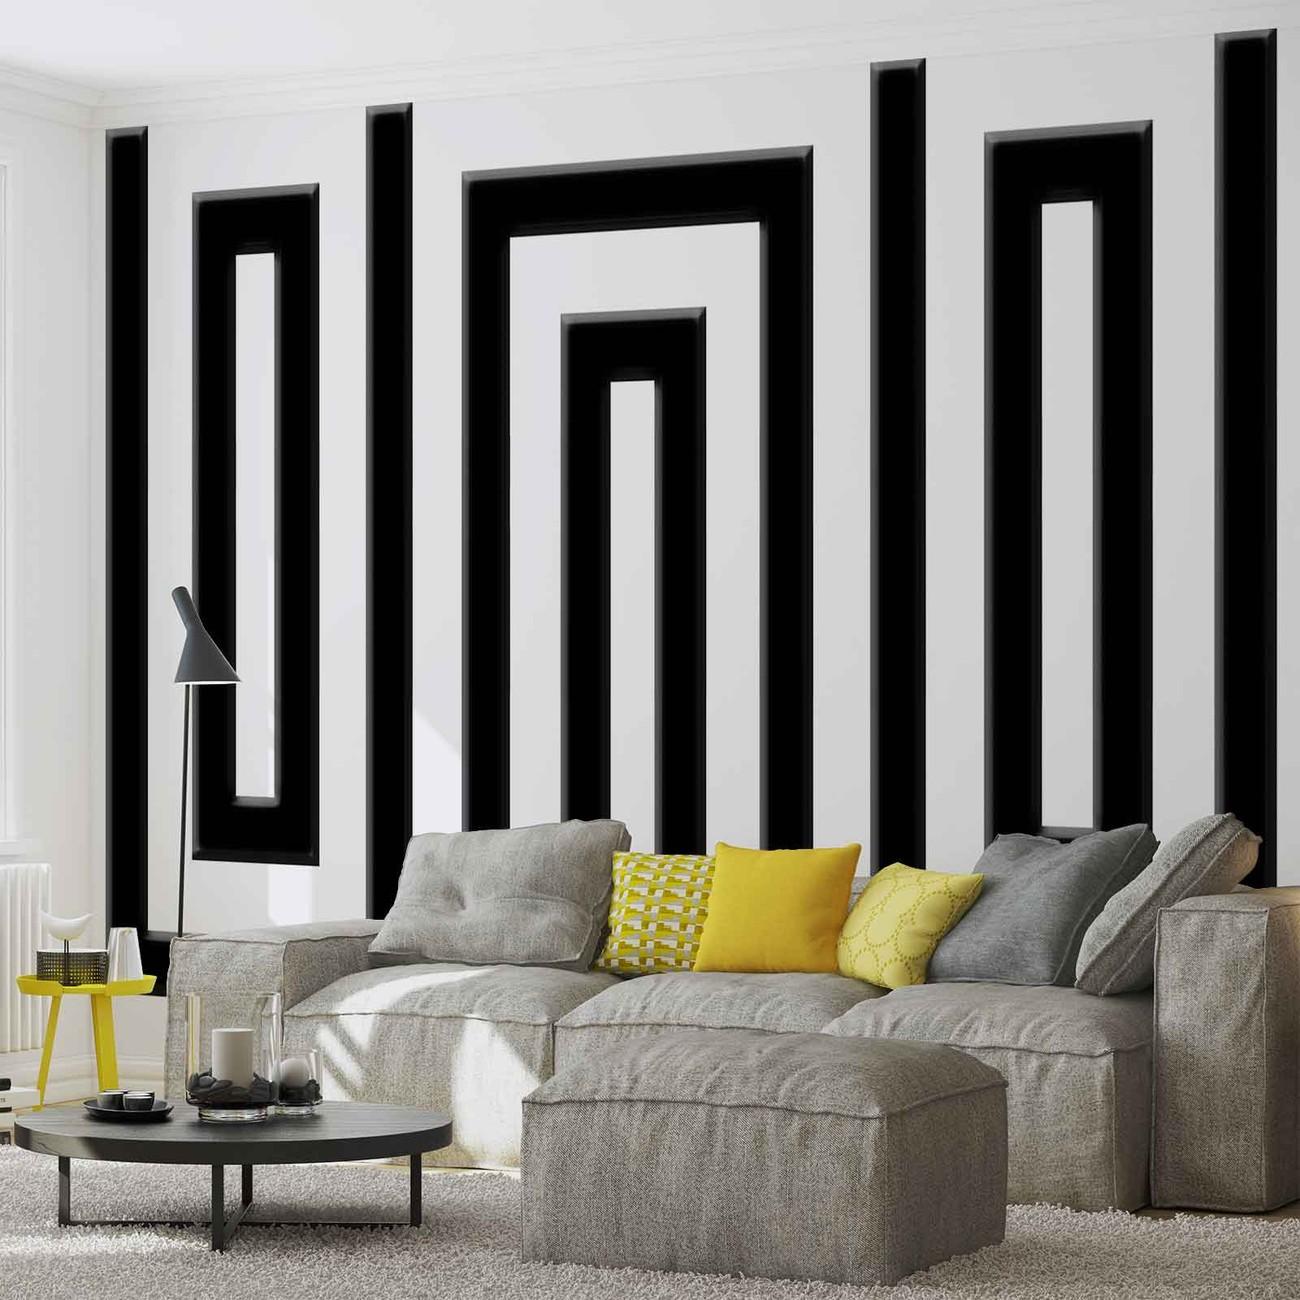 fototapete tapete abstrakte kunst bei europosters kostenloser versand. Black Bedroom Furniture Sets. Home Design Ideas